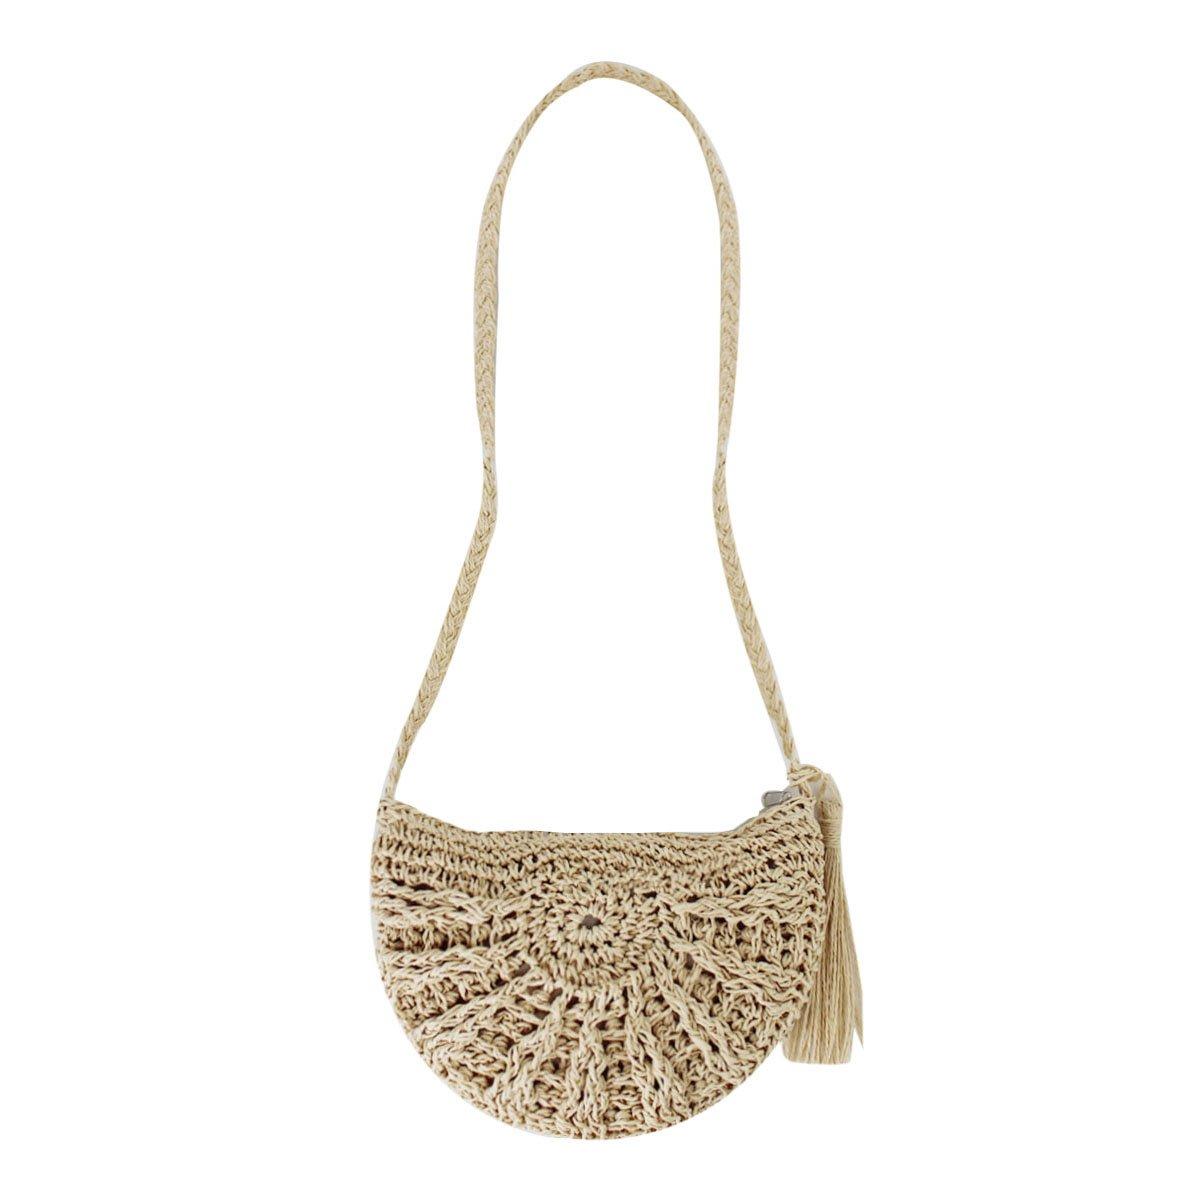 Sherry Bucket Bag Women Straw Summer Drawstring Handbag Purse Weave Shoulder Bags (Beige01)